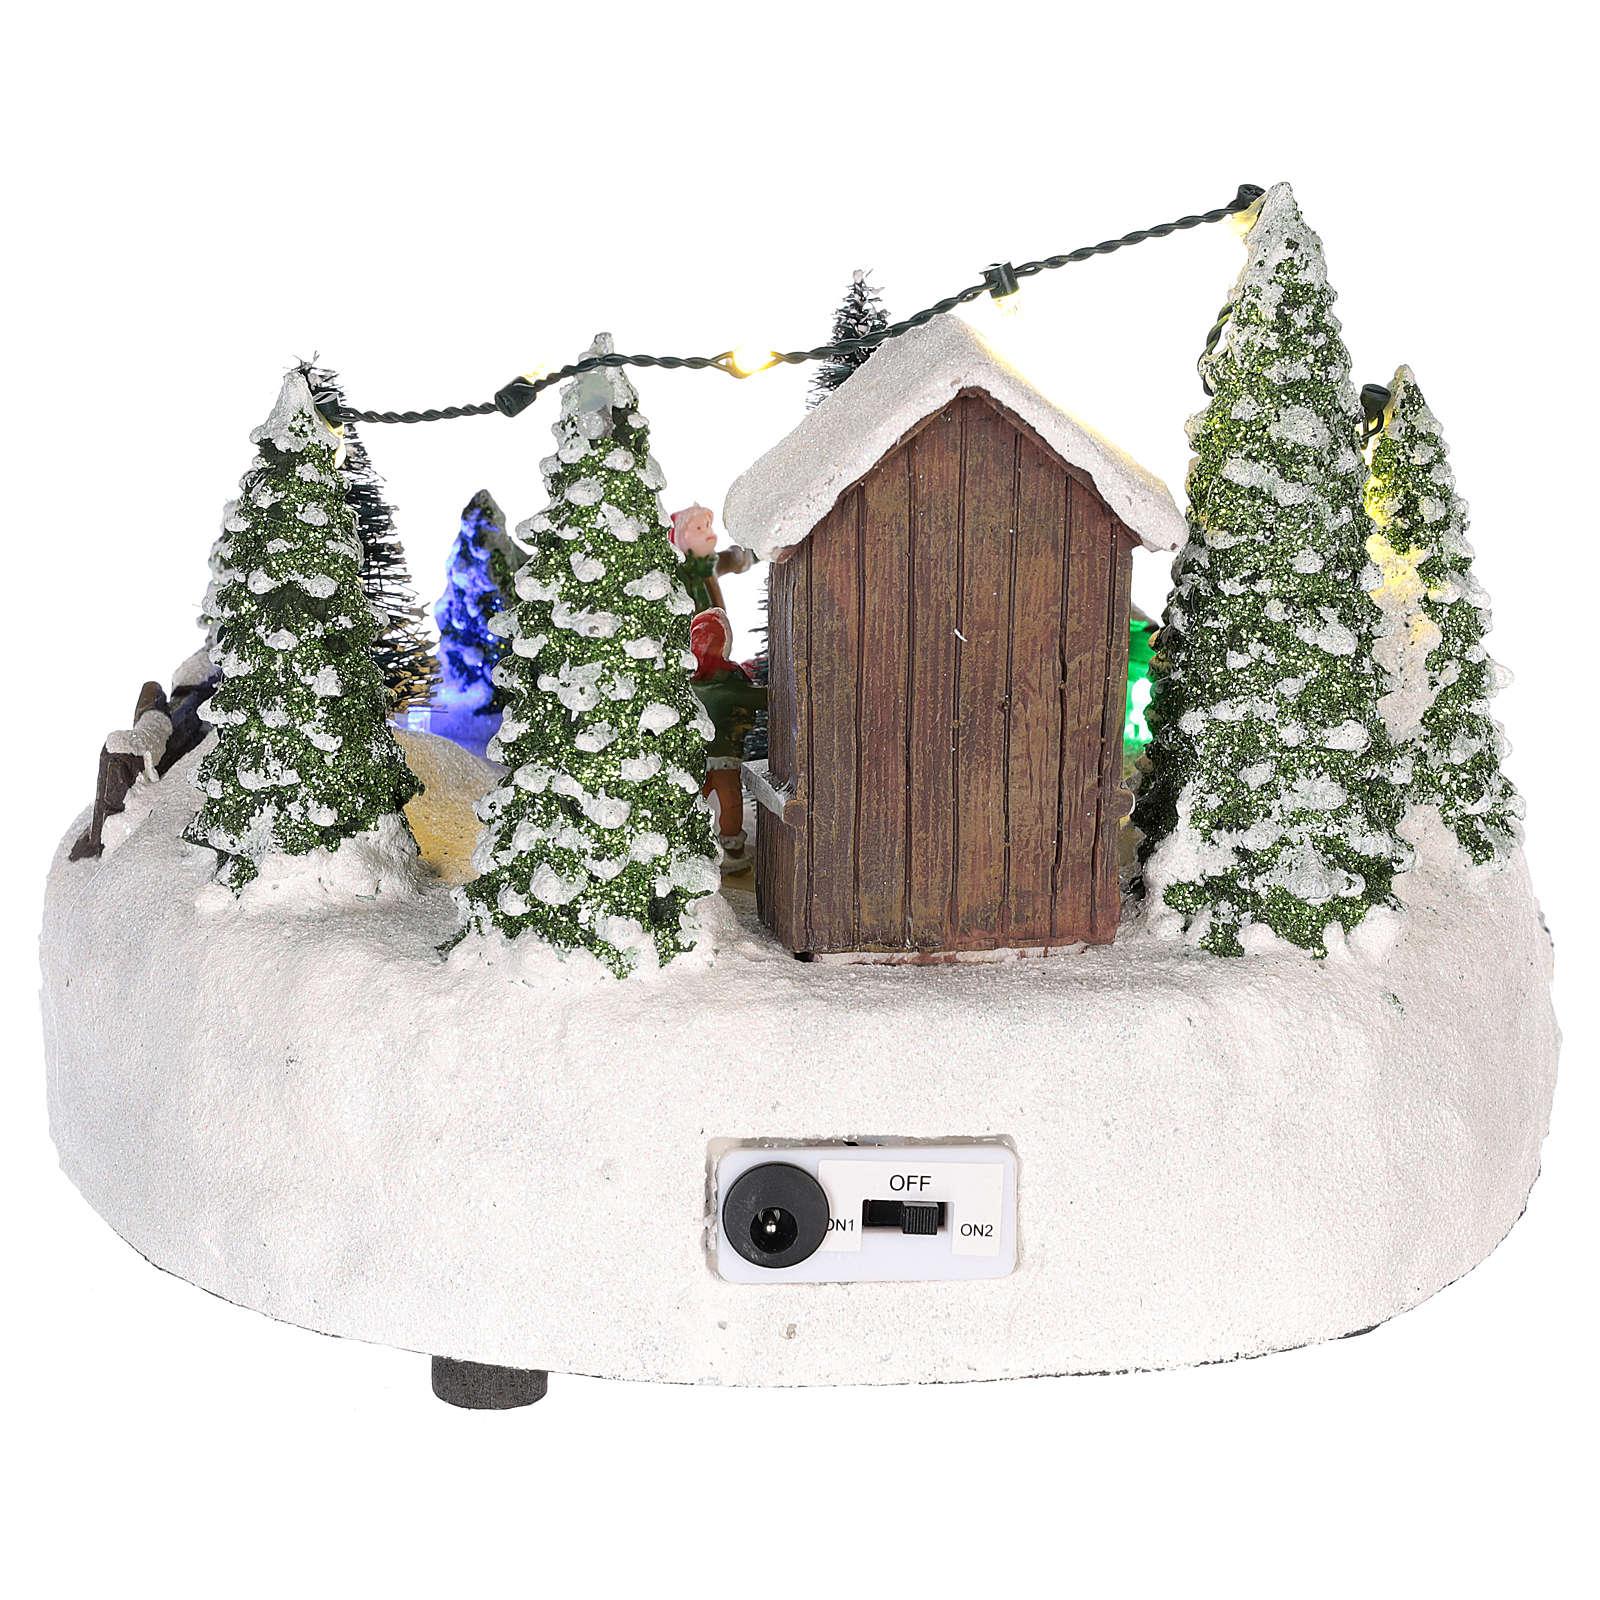 Christmas village with Christmas tree and skating rink 15x20 3